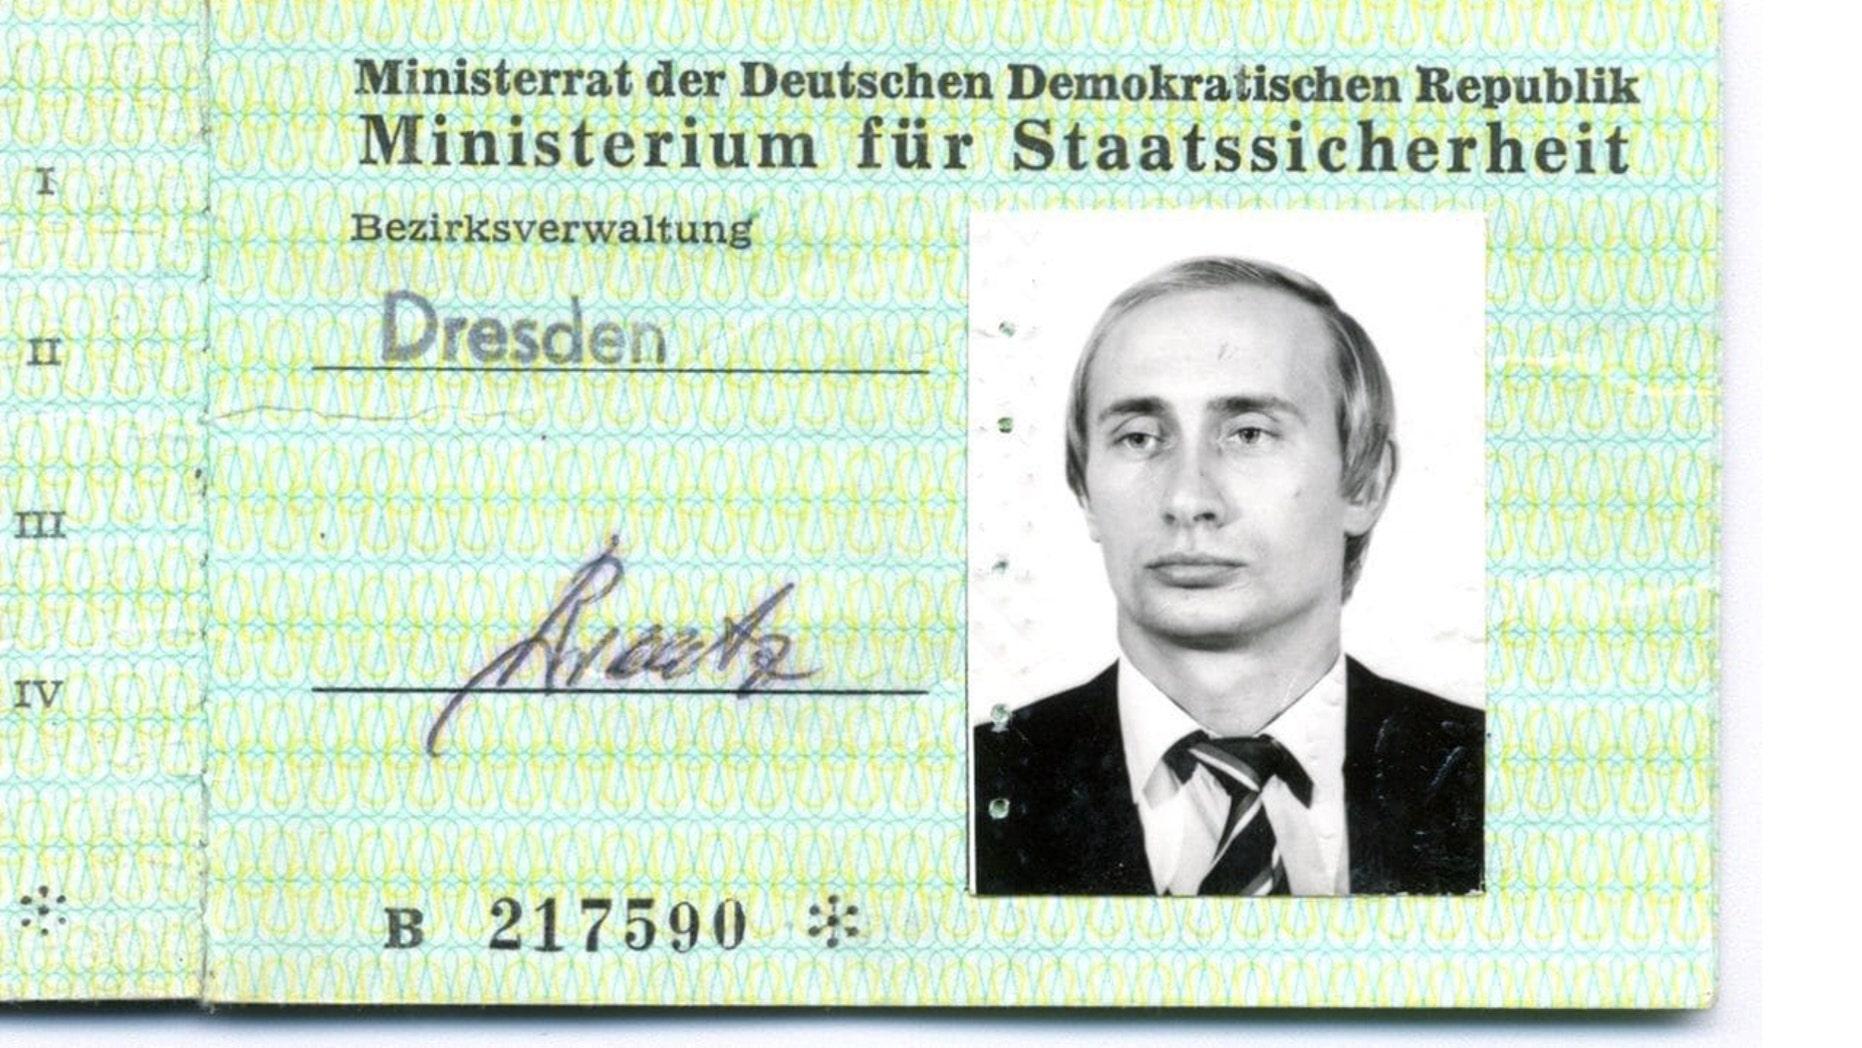 Vladimir Putin's Stasi ID card has been found in Dresden.